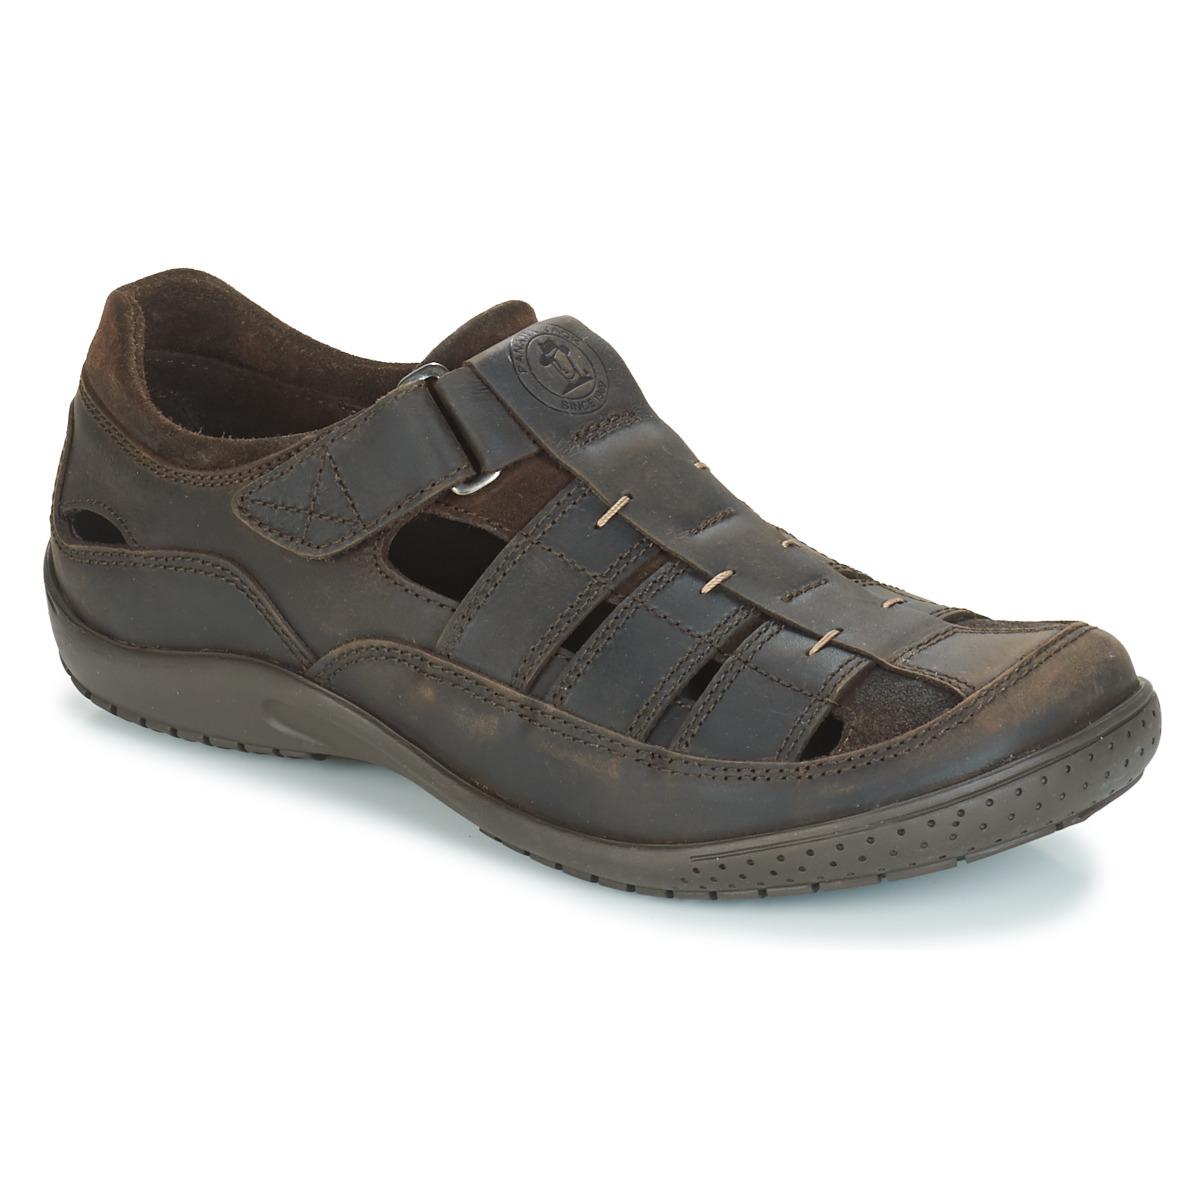 Panama Jack MERIDIAN Braun - Kostenloser Versand bei Spartoode ! - Schuhe Sandalen / Sandaletten Herren 107,10 €